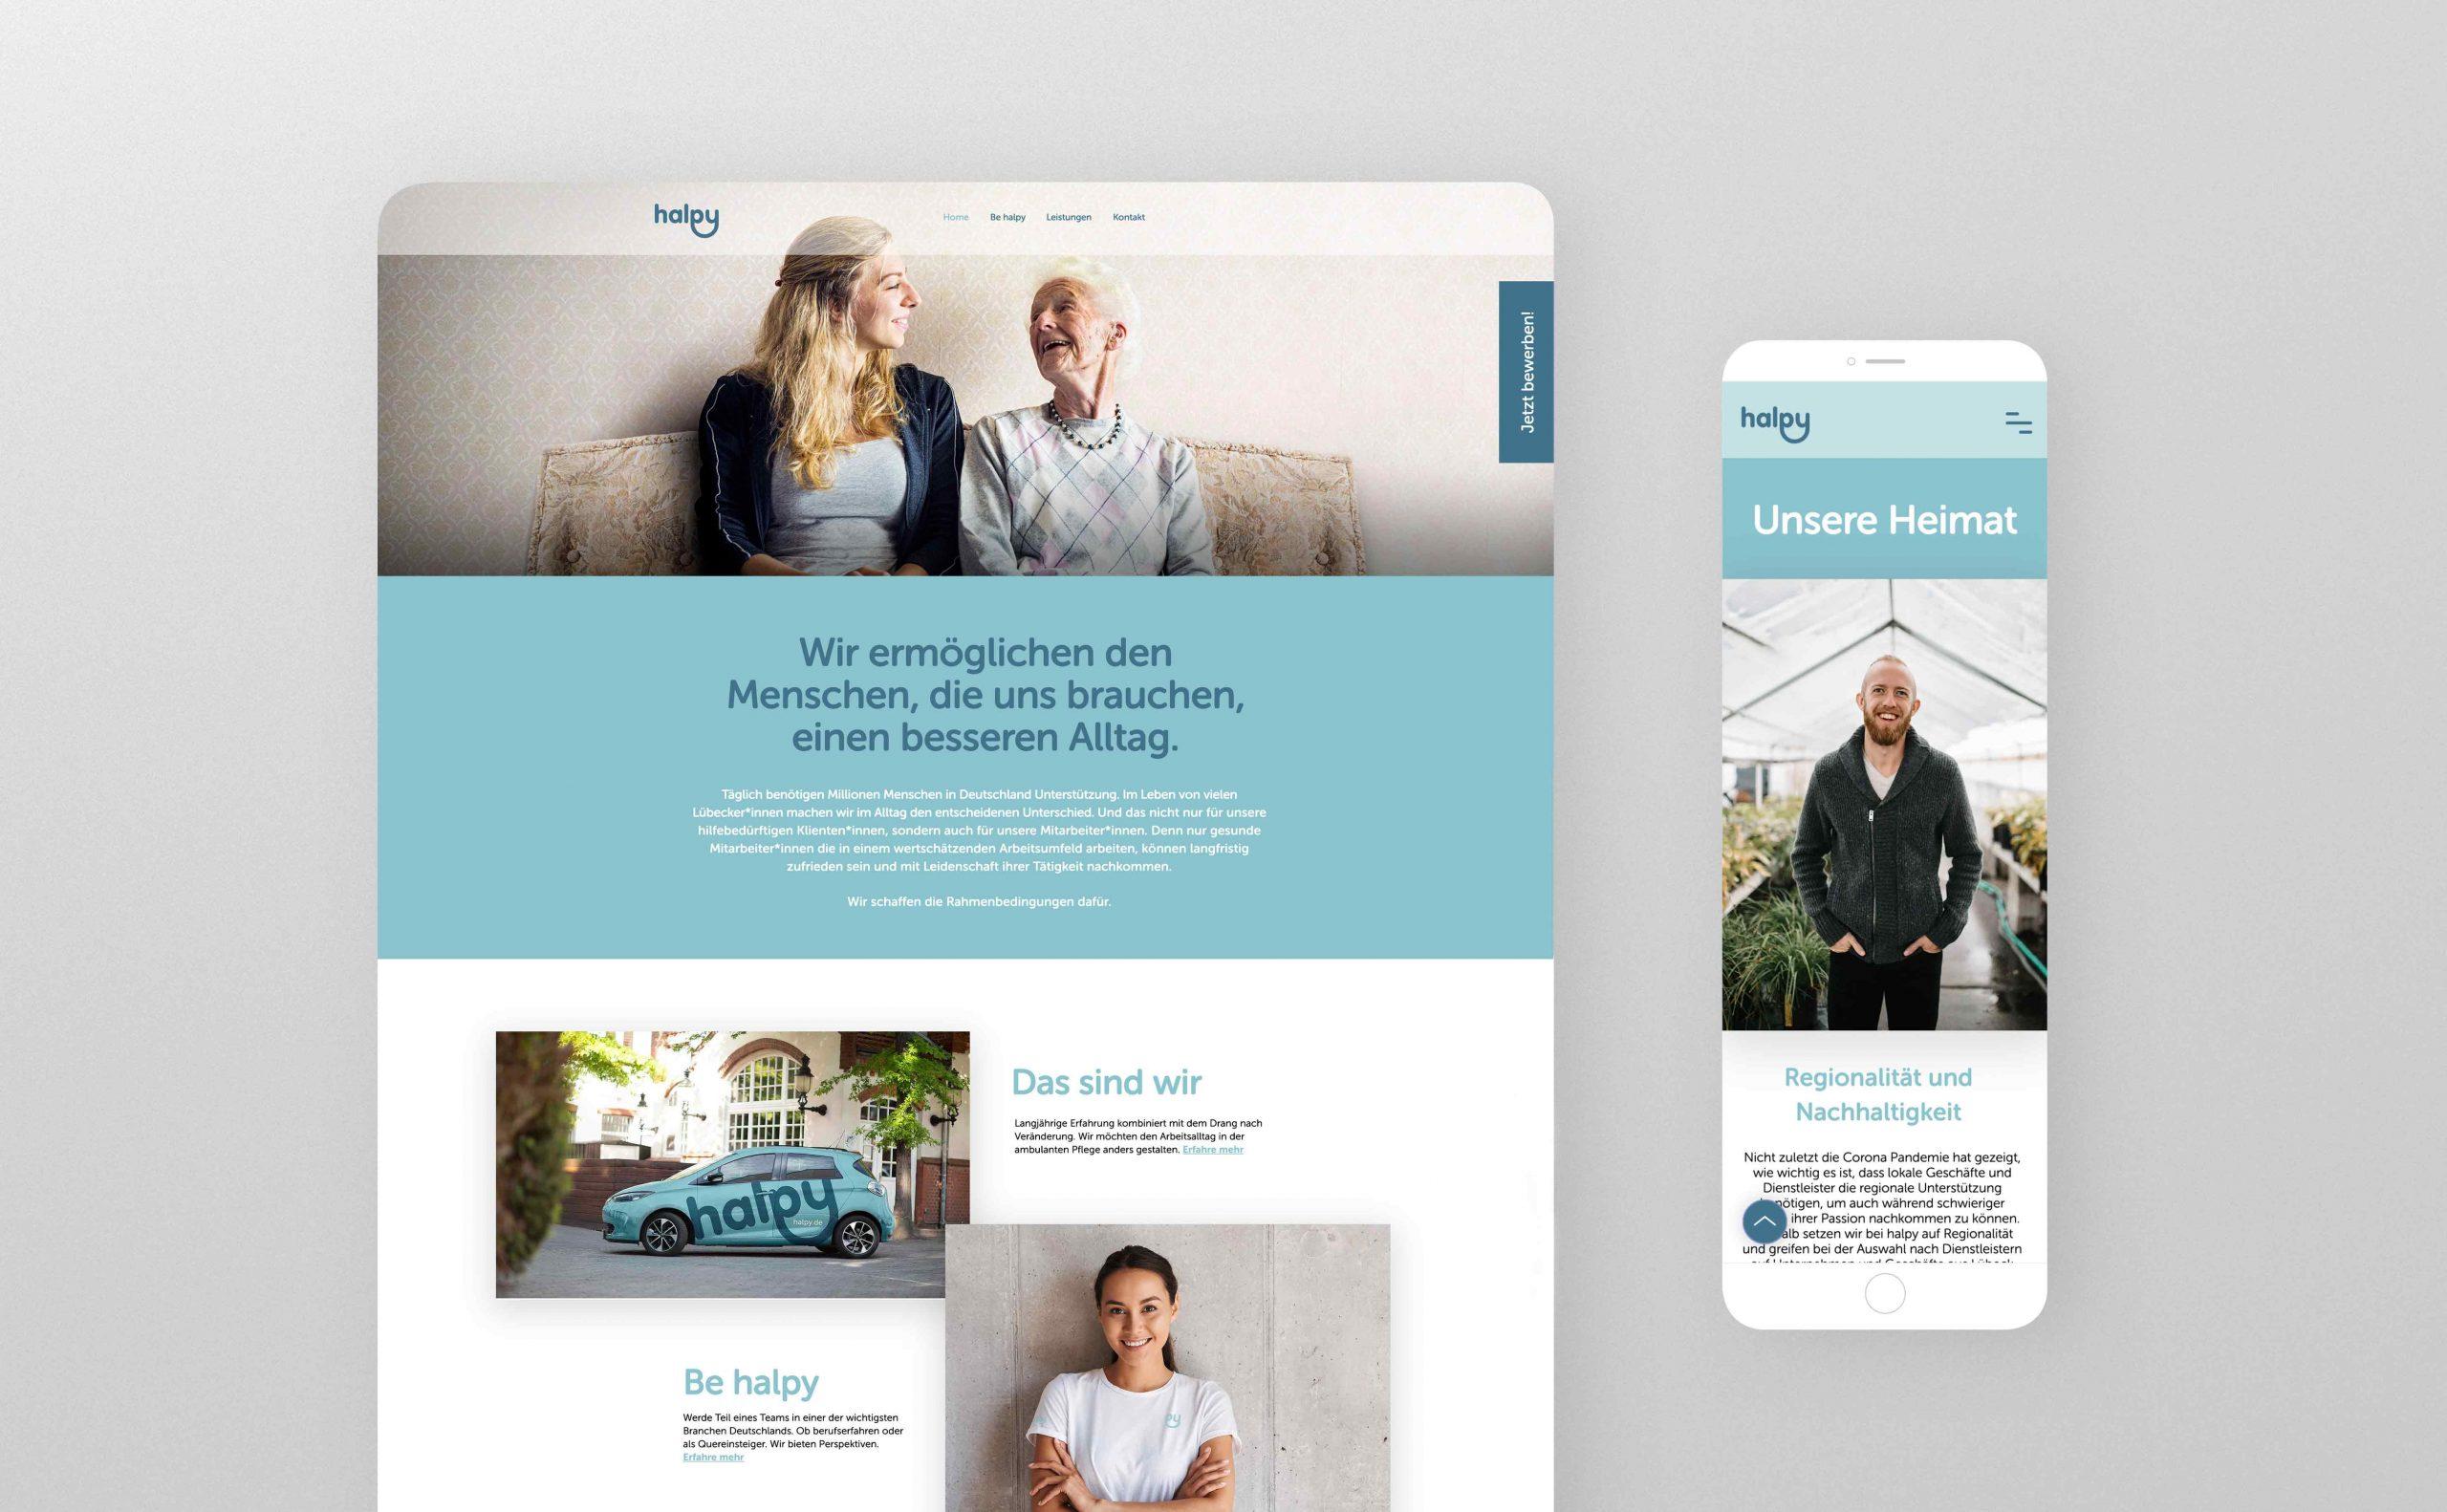 halpy-website-design-low-grafik-design